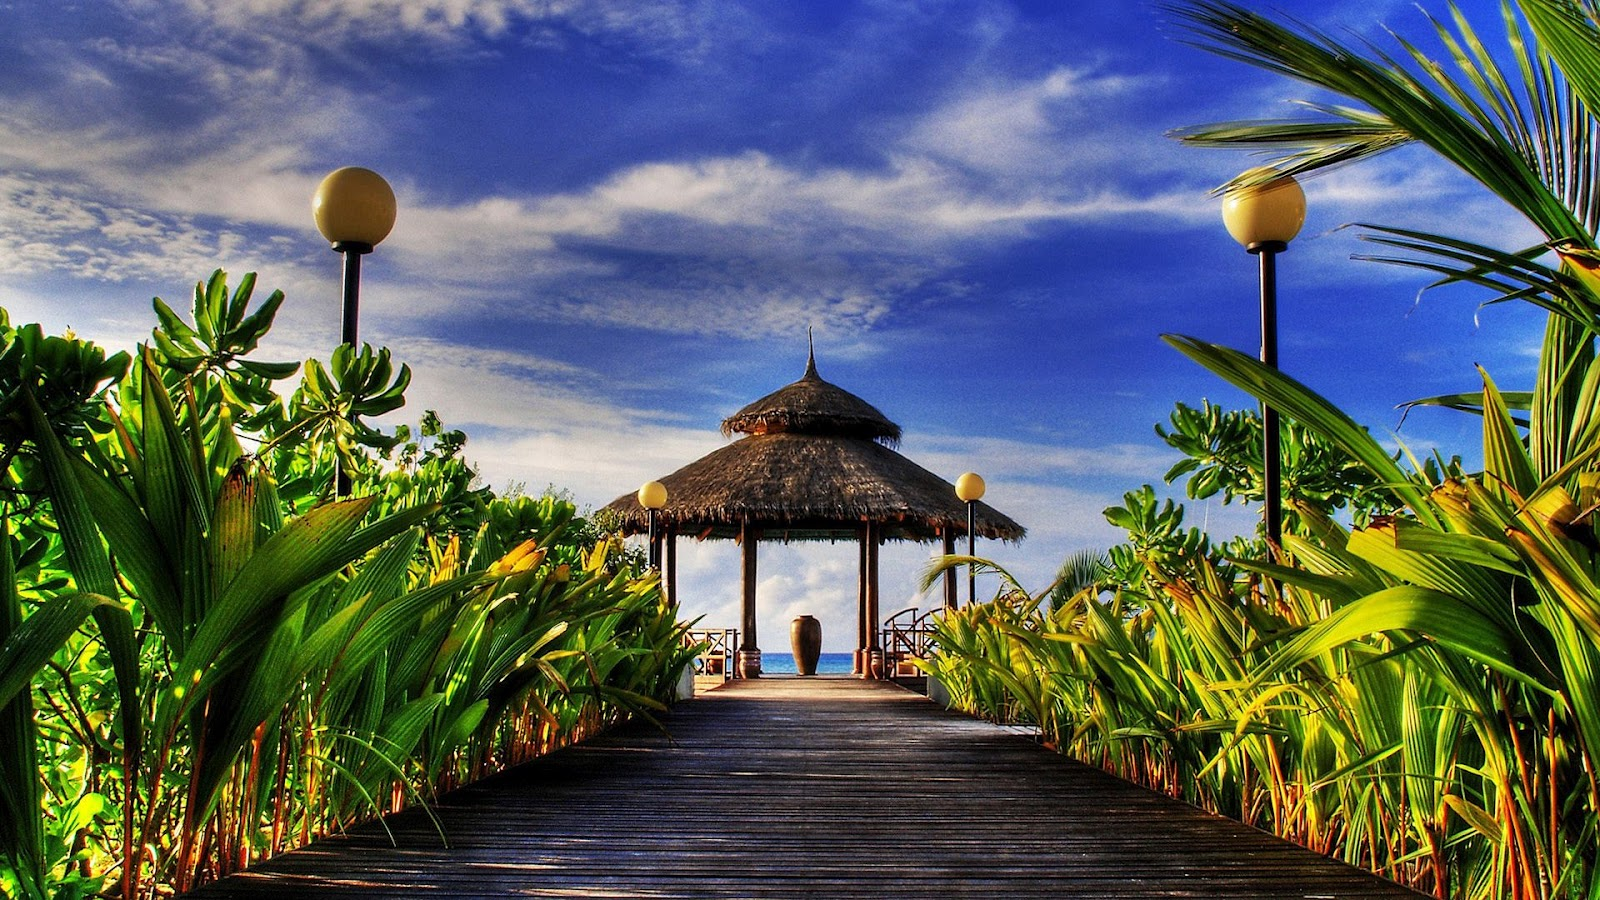 http://2.bp.blogspot.com/-vB8rywEu1Qw/UGz_Tfs5nTI/AAAAAAAAAhk/a6-beVx7Vmw/s1600/welcome+paradise+hdr+HD.jpg